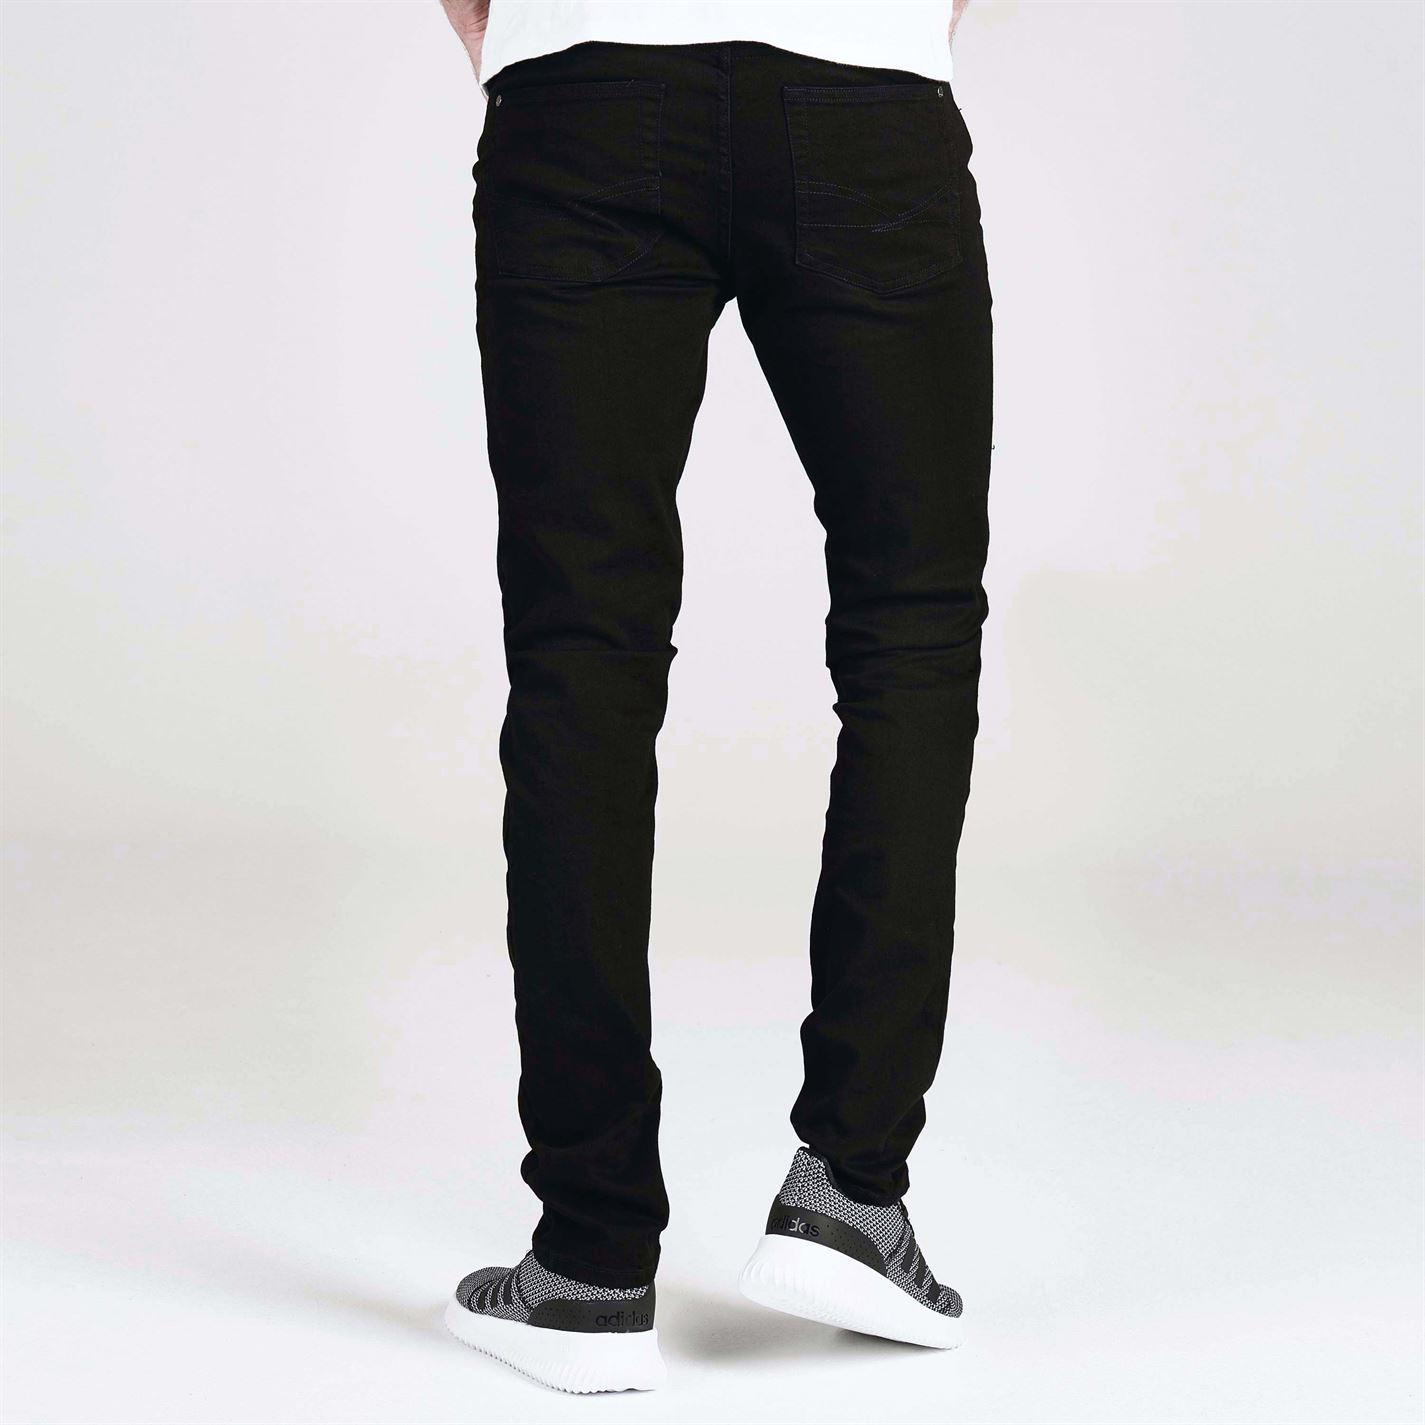 Jeans-Denim-Firetrap-Skinny-Mens-Trouser-Black thumbnail 14